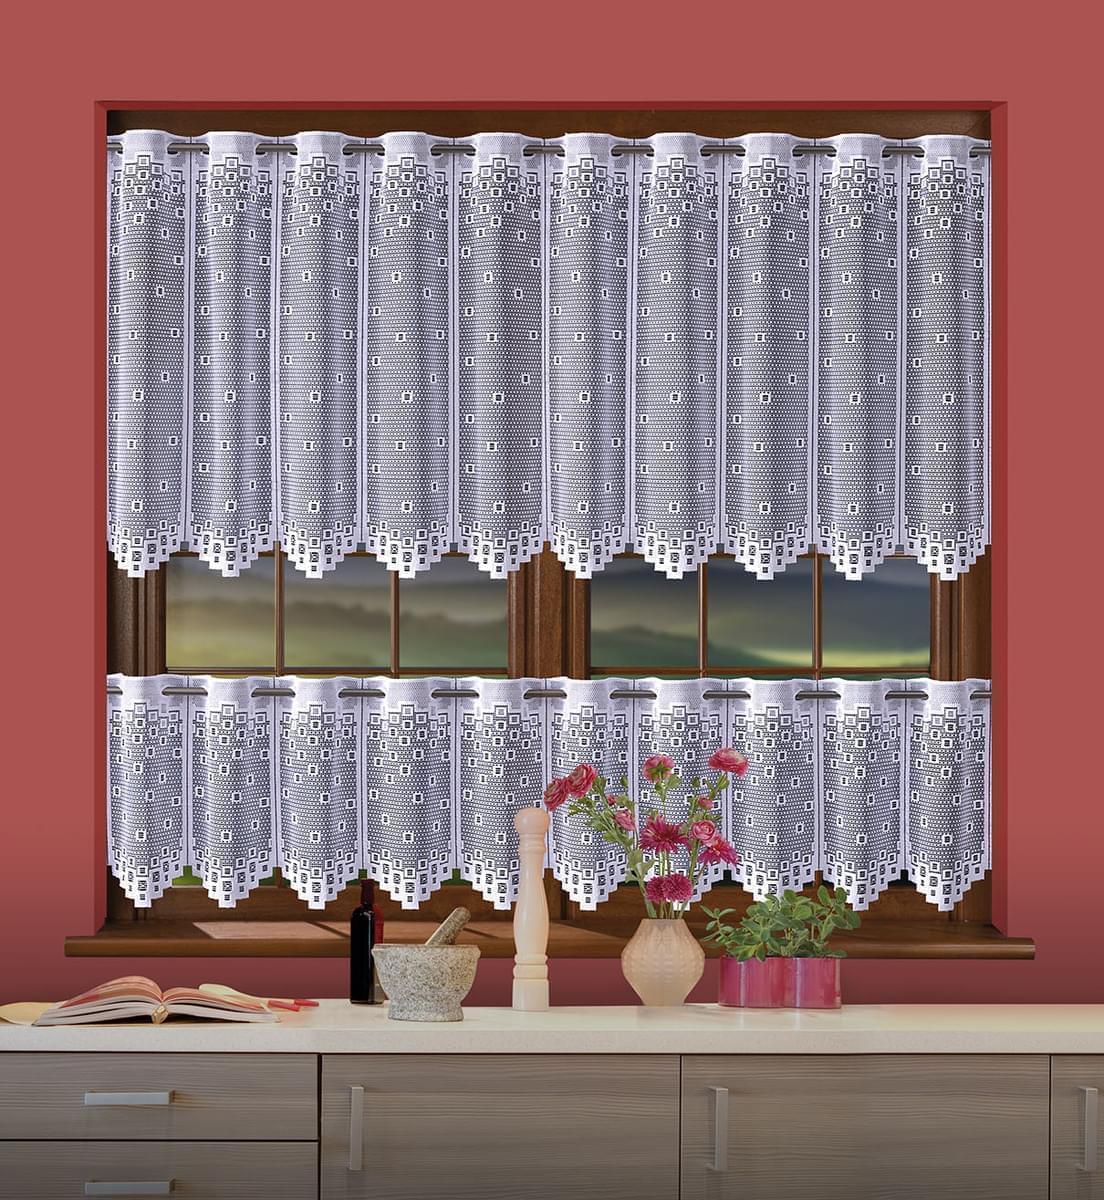 Forbyt, Hotová záclona, Amálie drapérka komplet, 250 x 40 + 250 x 60 cm 250 x 40 + 250 x 60 cm